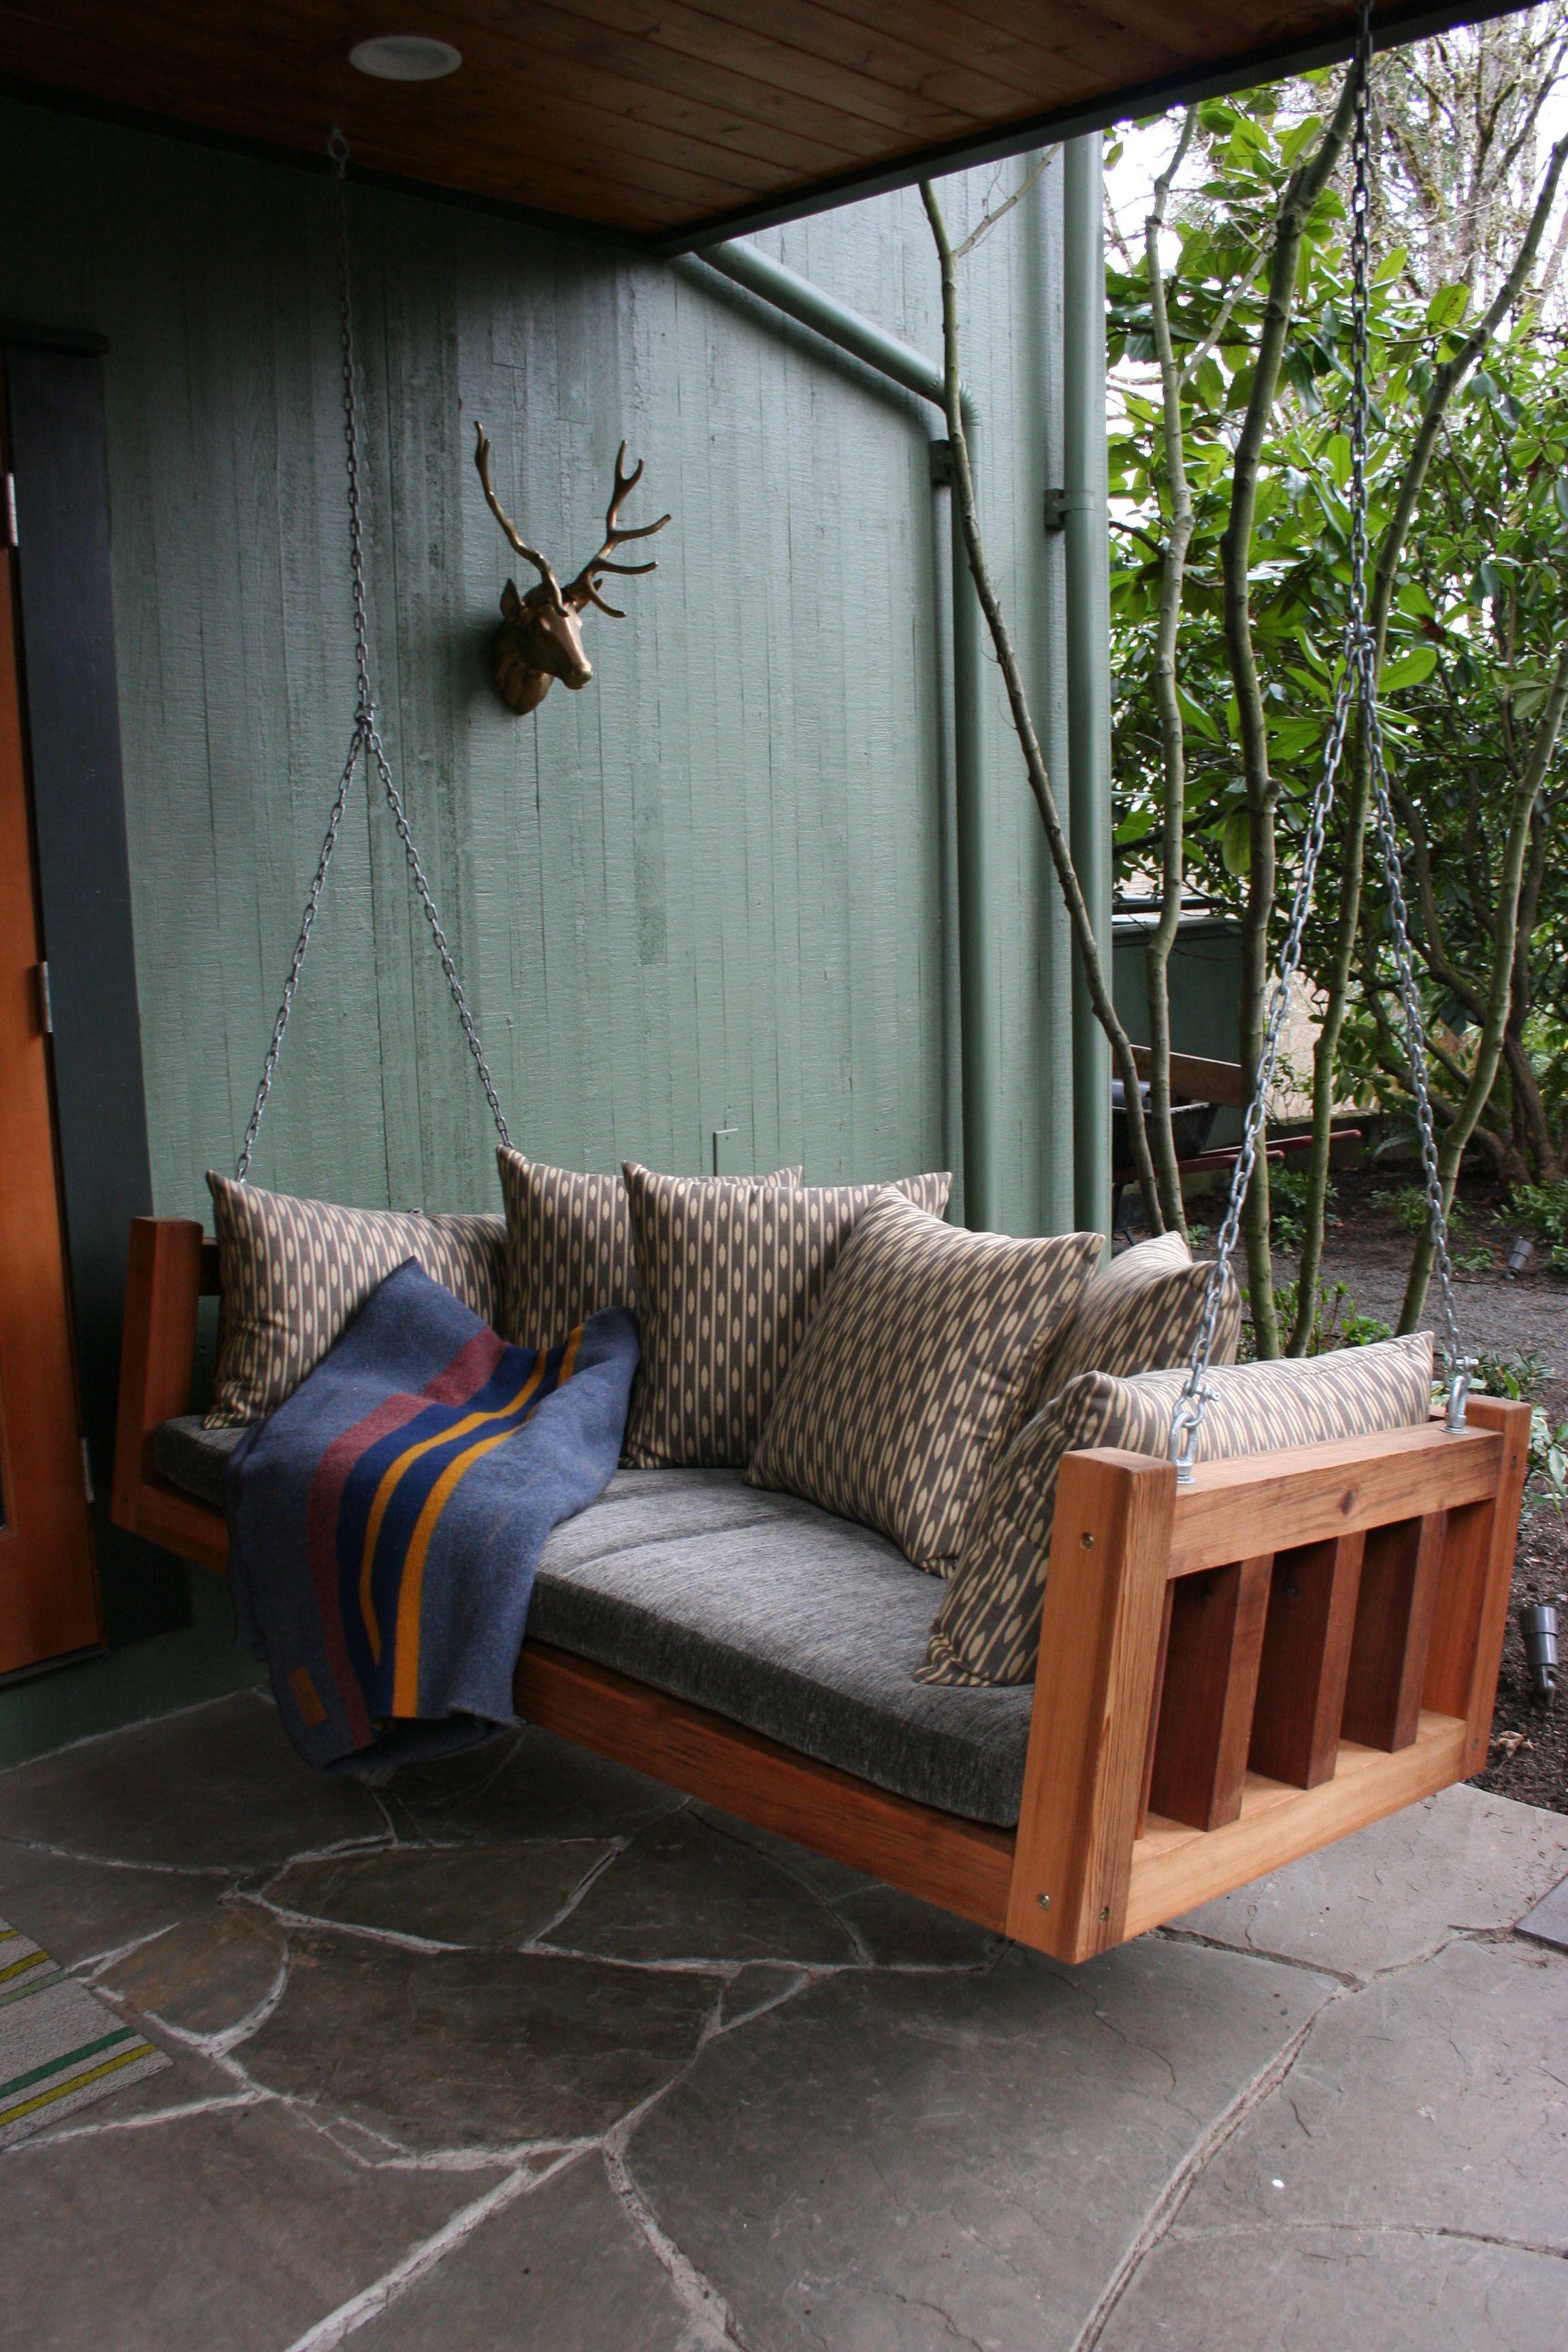 Edid southwest hills portland residence custom outdoor swing